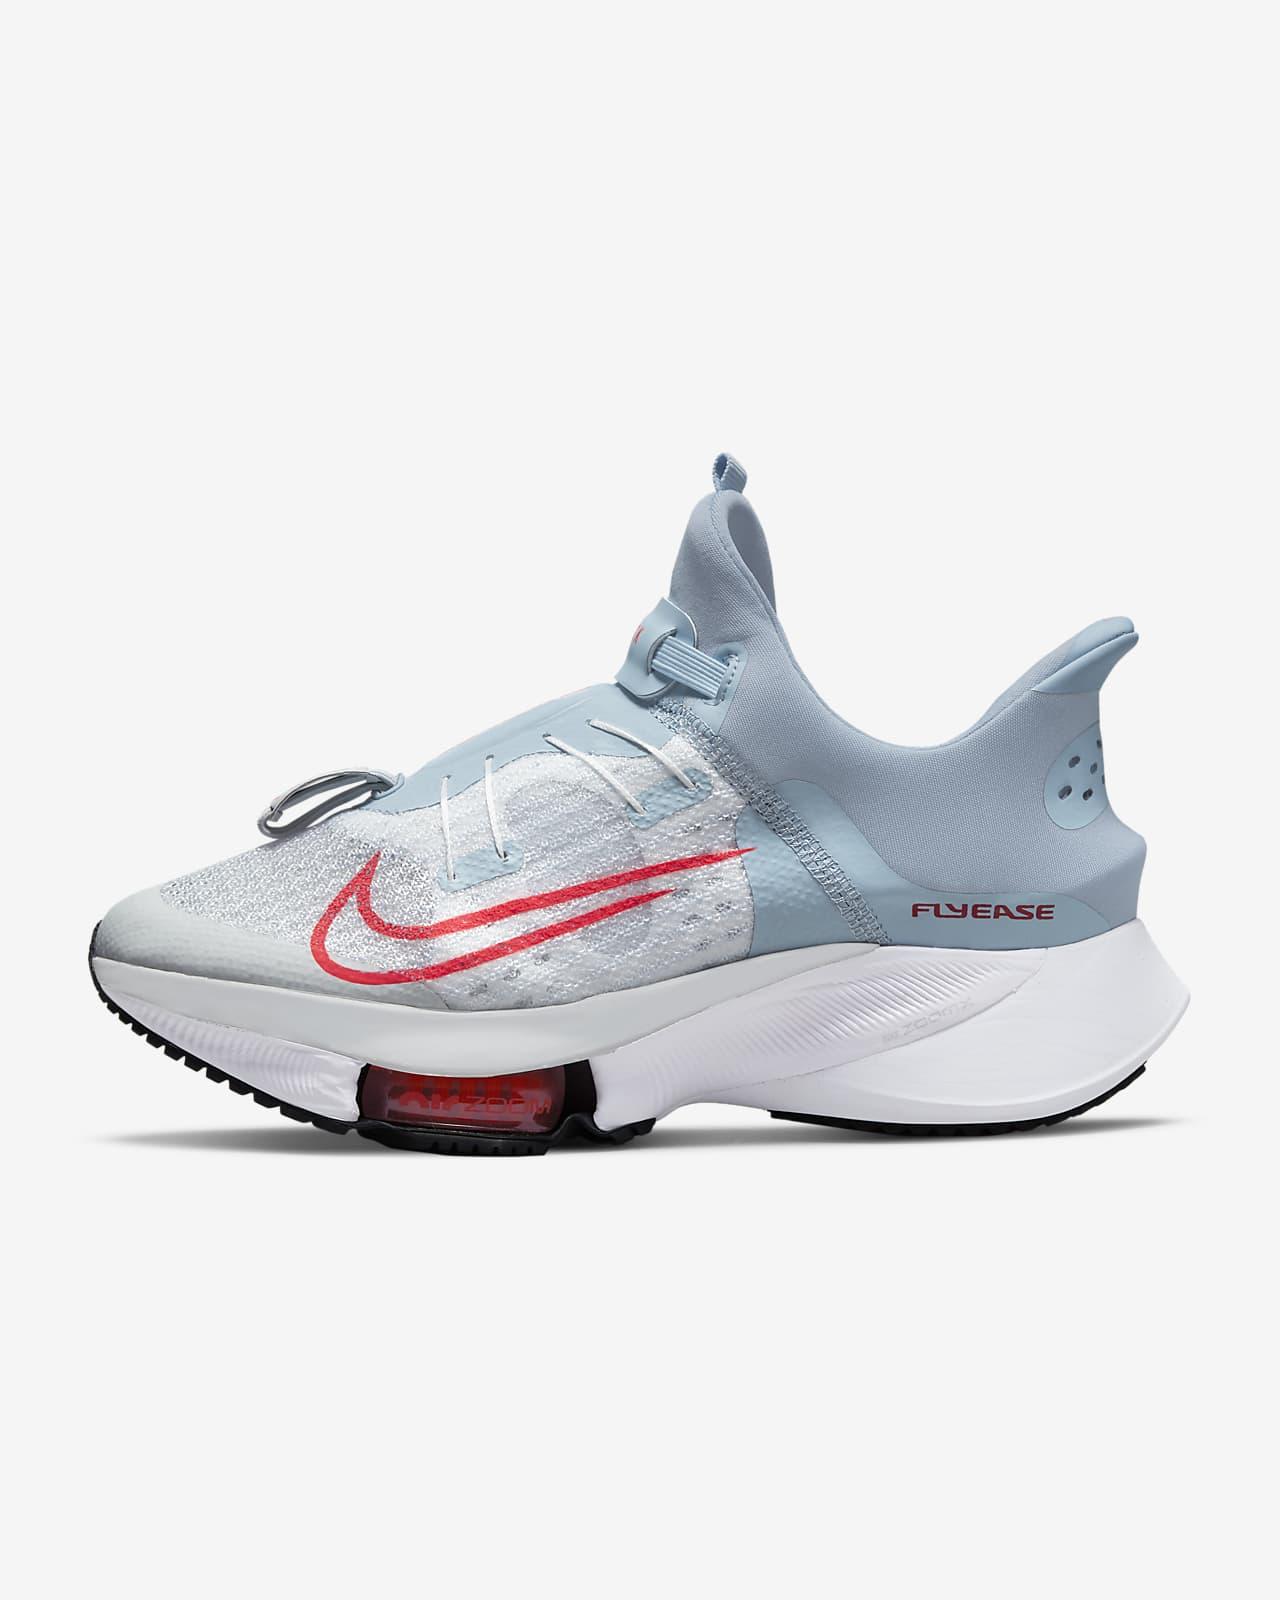 Женские беговые кроссовки Nike Air Zoom Tempo NEXT% FlyEase